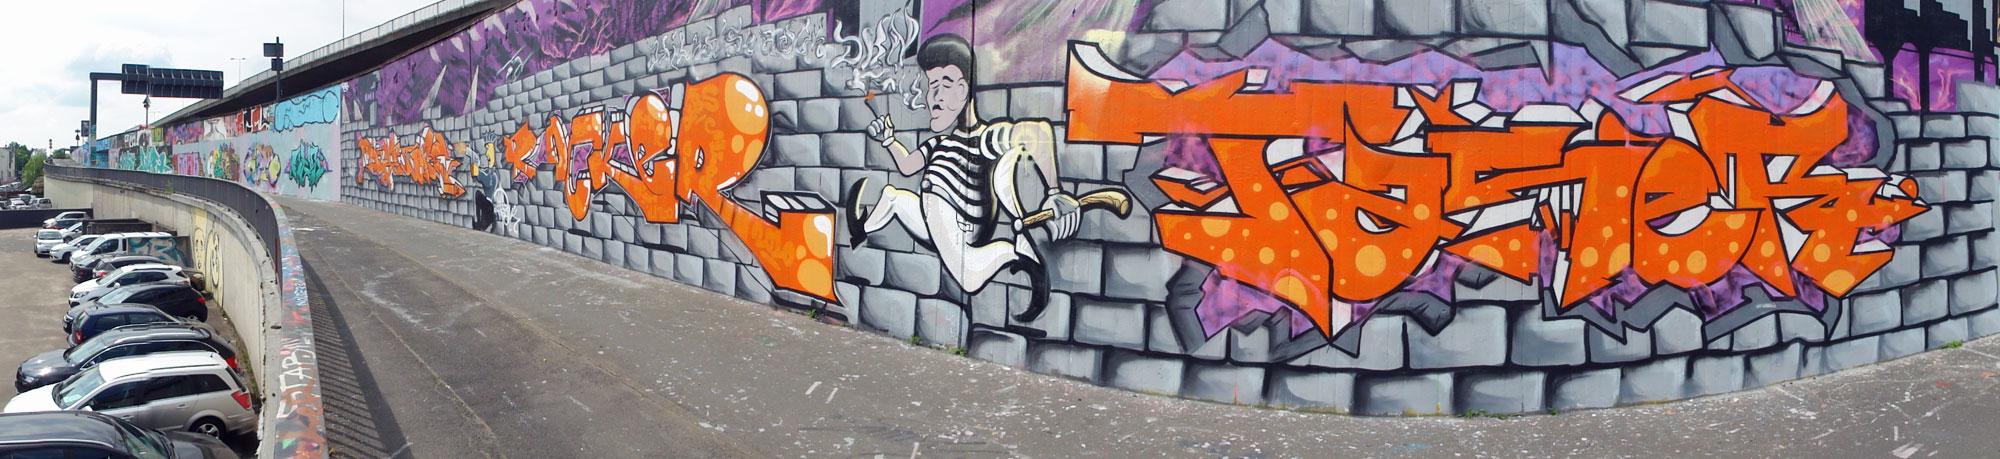 dkn-wall-hall-of-fame-frankfurt-ratsweg-riederhoefe-2